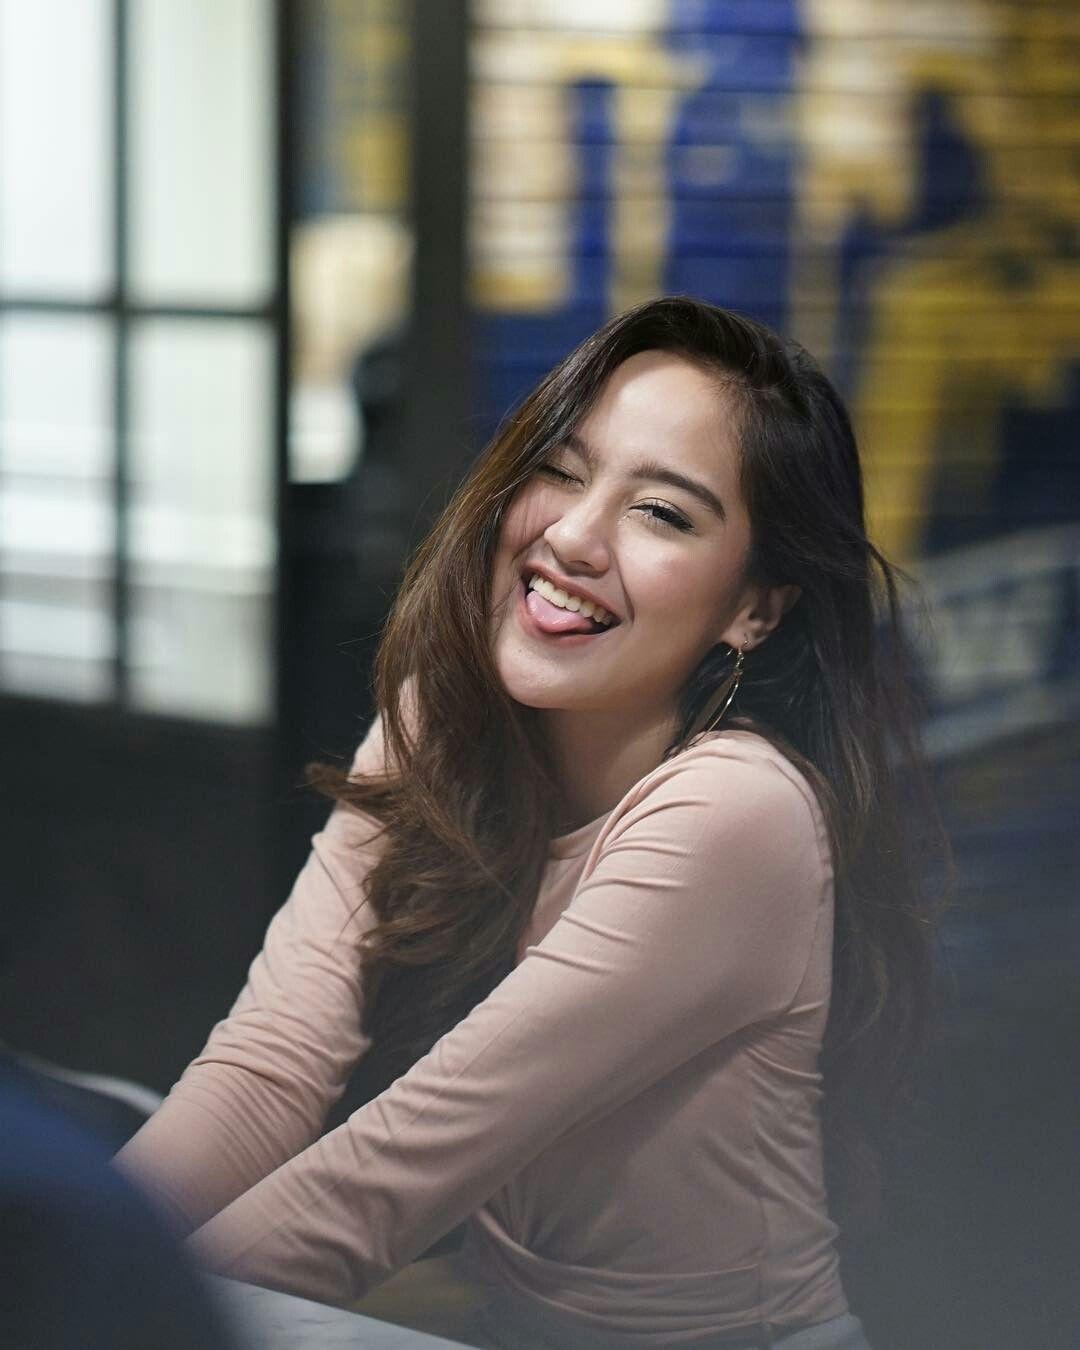 Salshabilla Adriani Instagram Salshabillaadr Indonesia Girl Gadis Tumblr Fotografi Selebritas